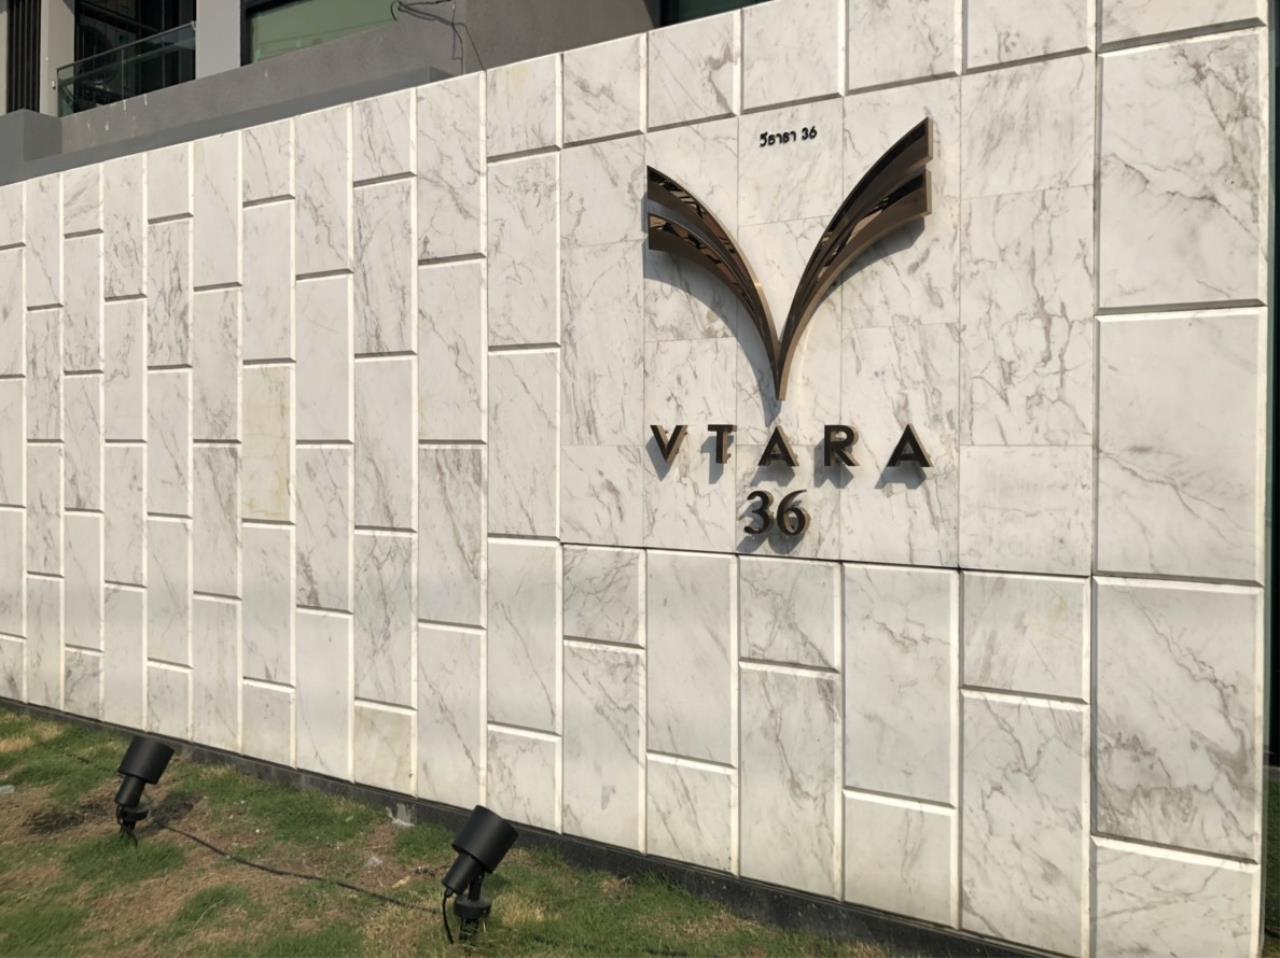 Property Thai Sale Agency's VTARA 36 1